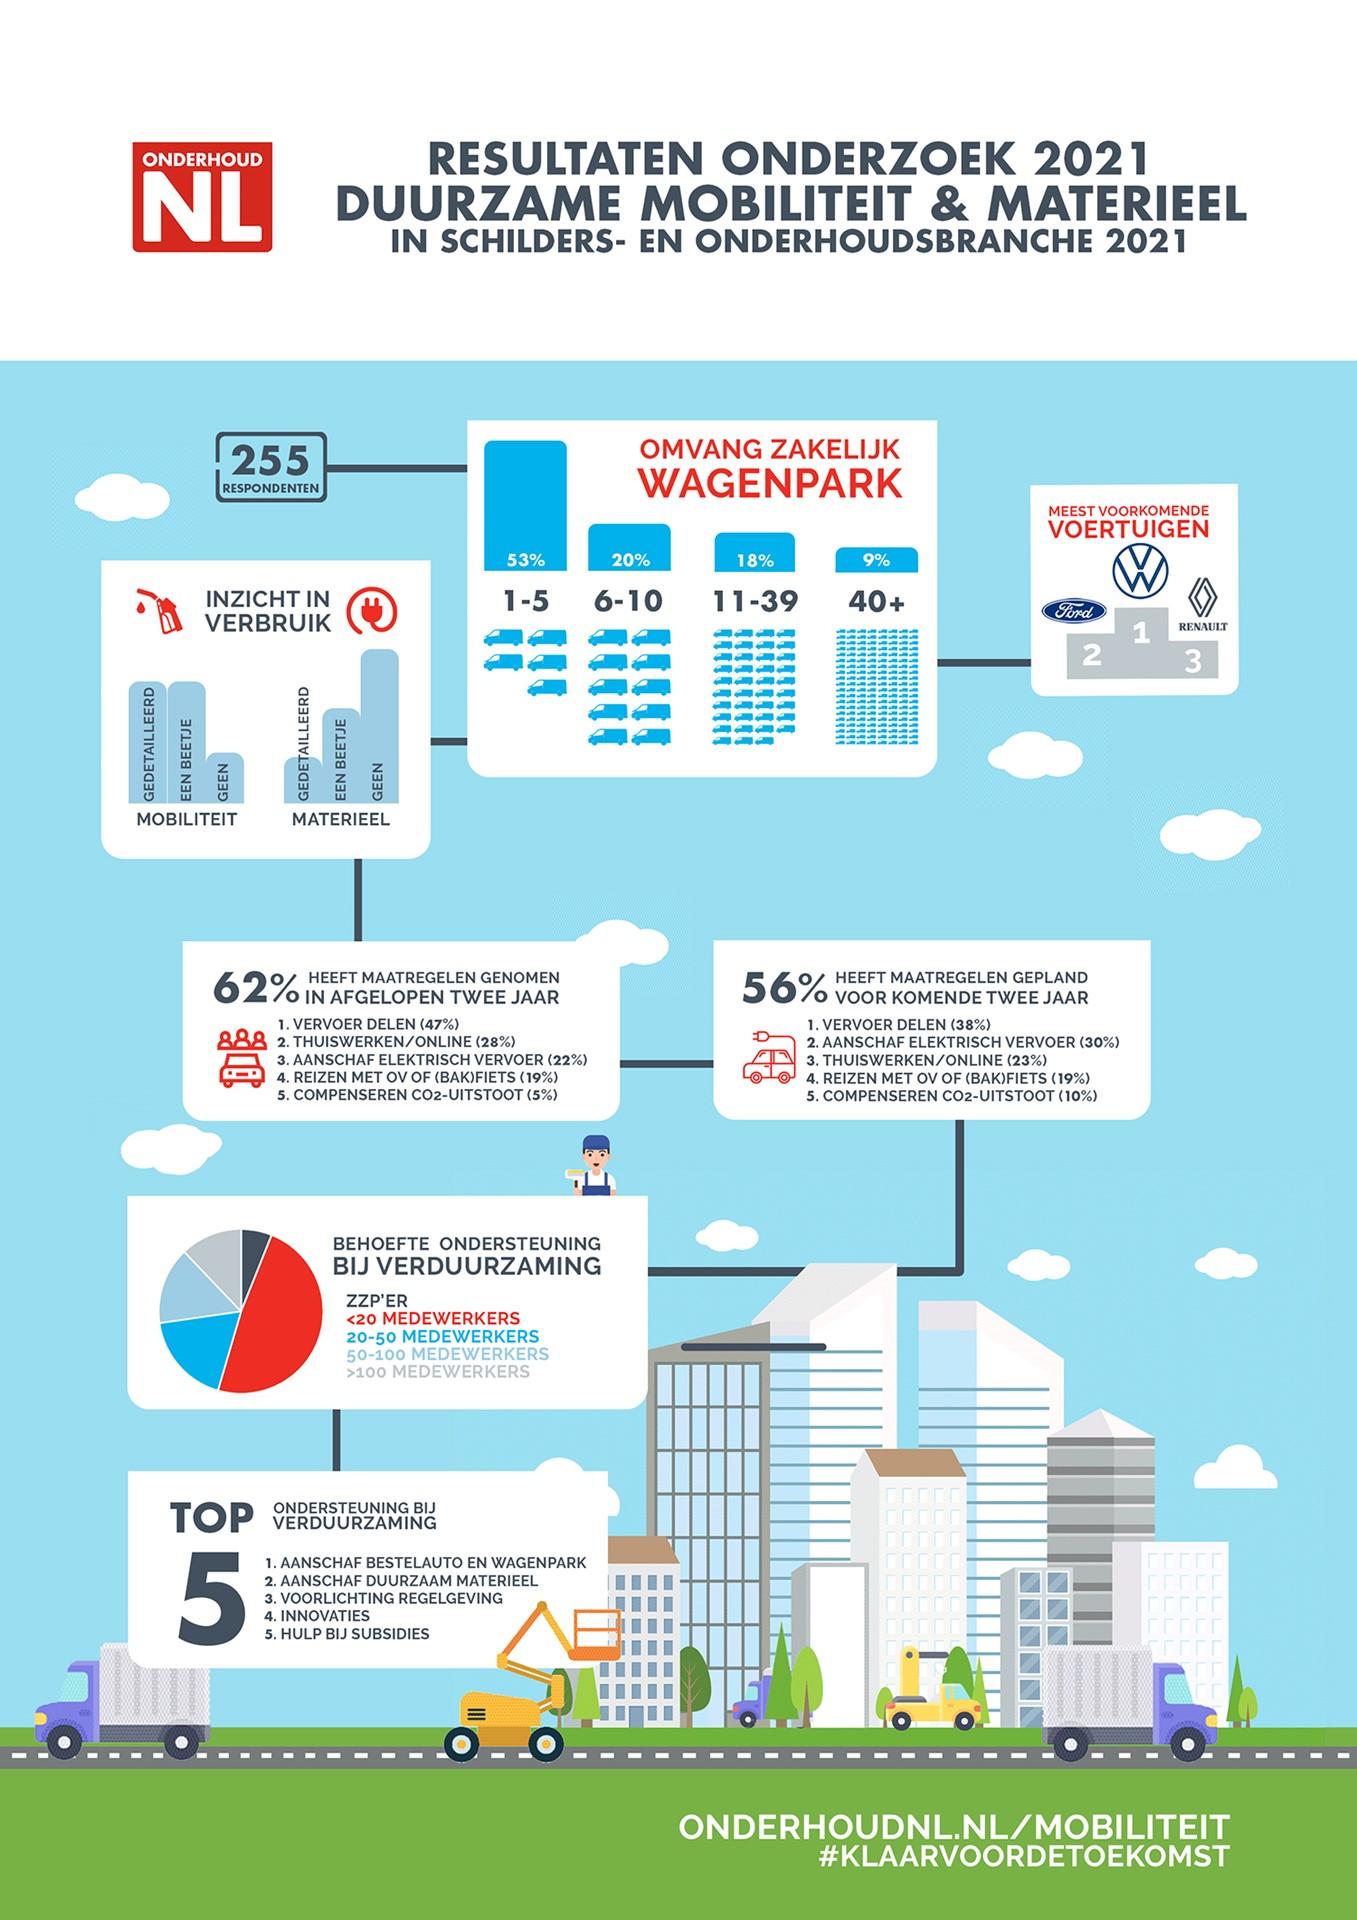 Infographic - Duurzame mobiliteit & materieel 2021 - OnderhoudNL - DEF.jpg